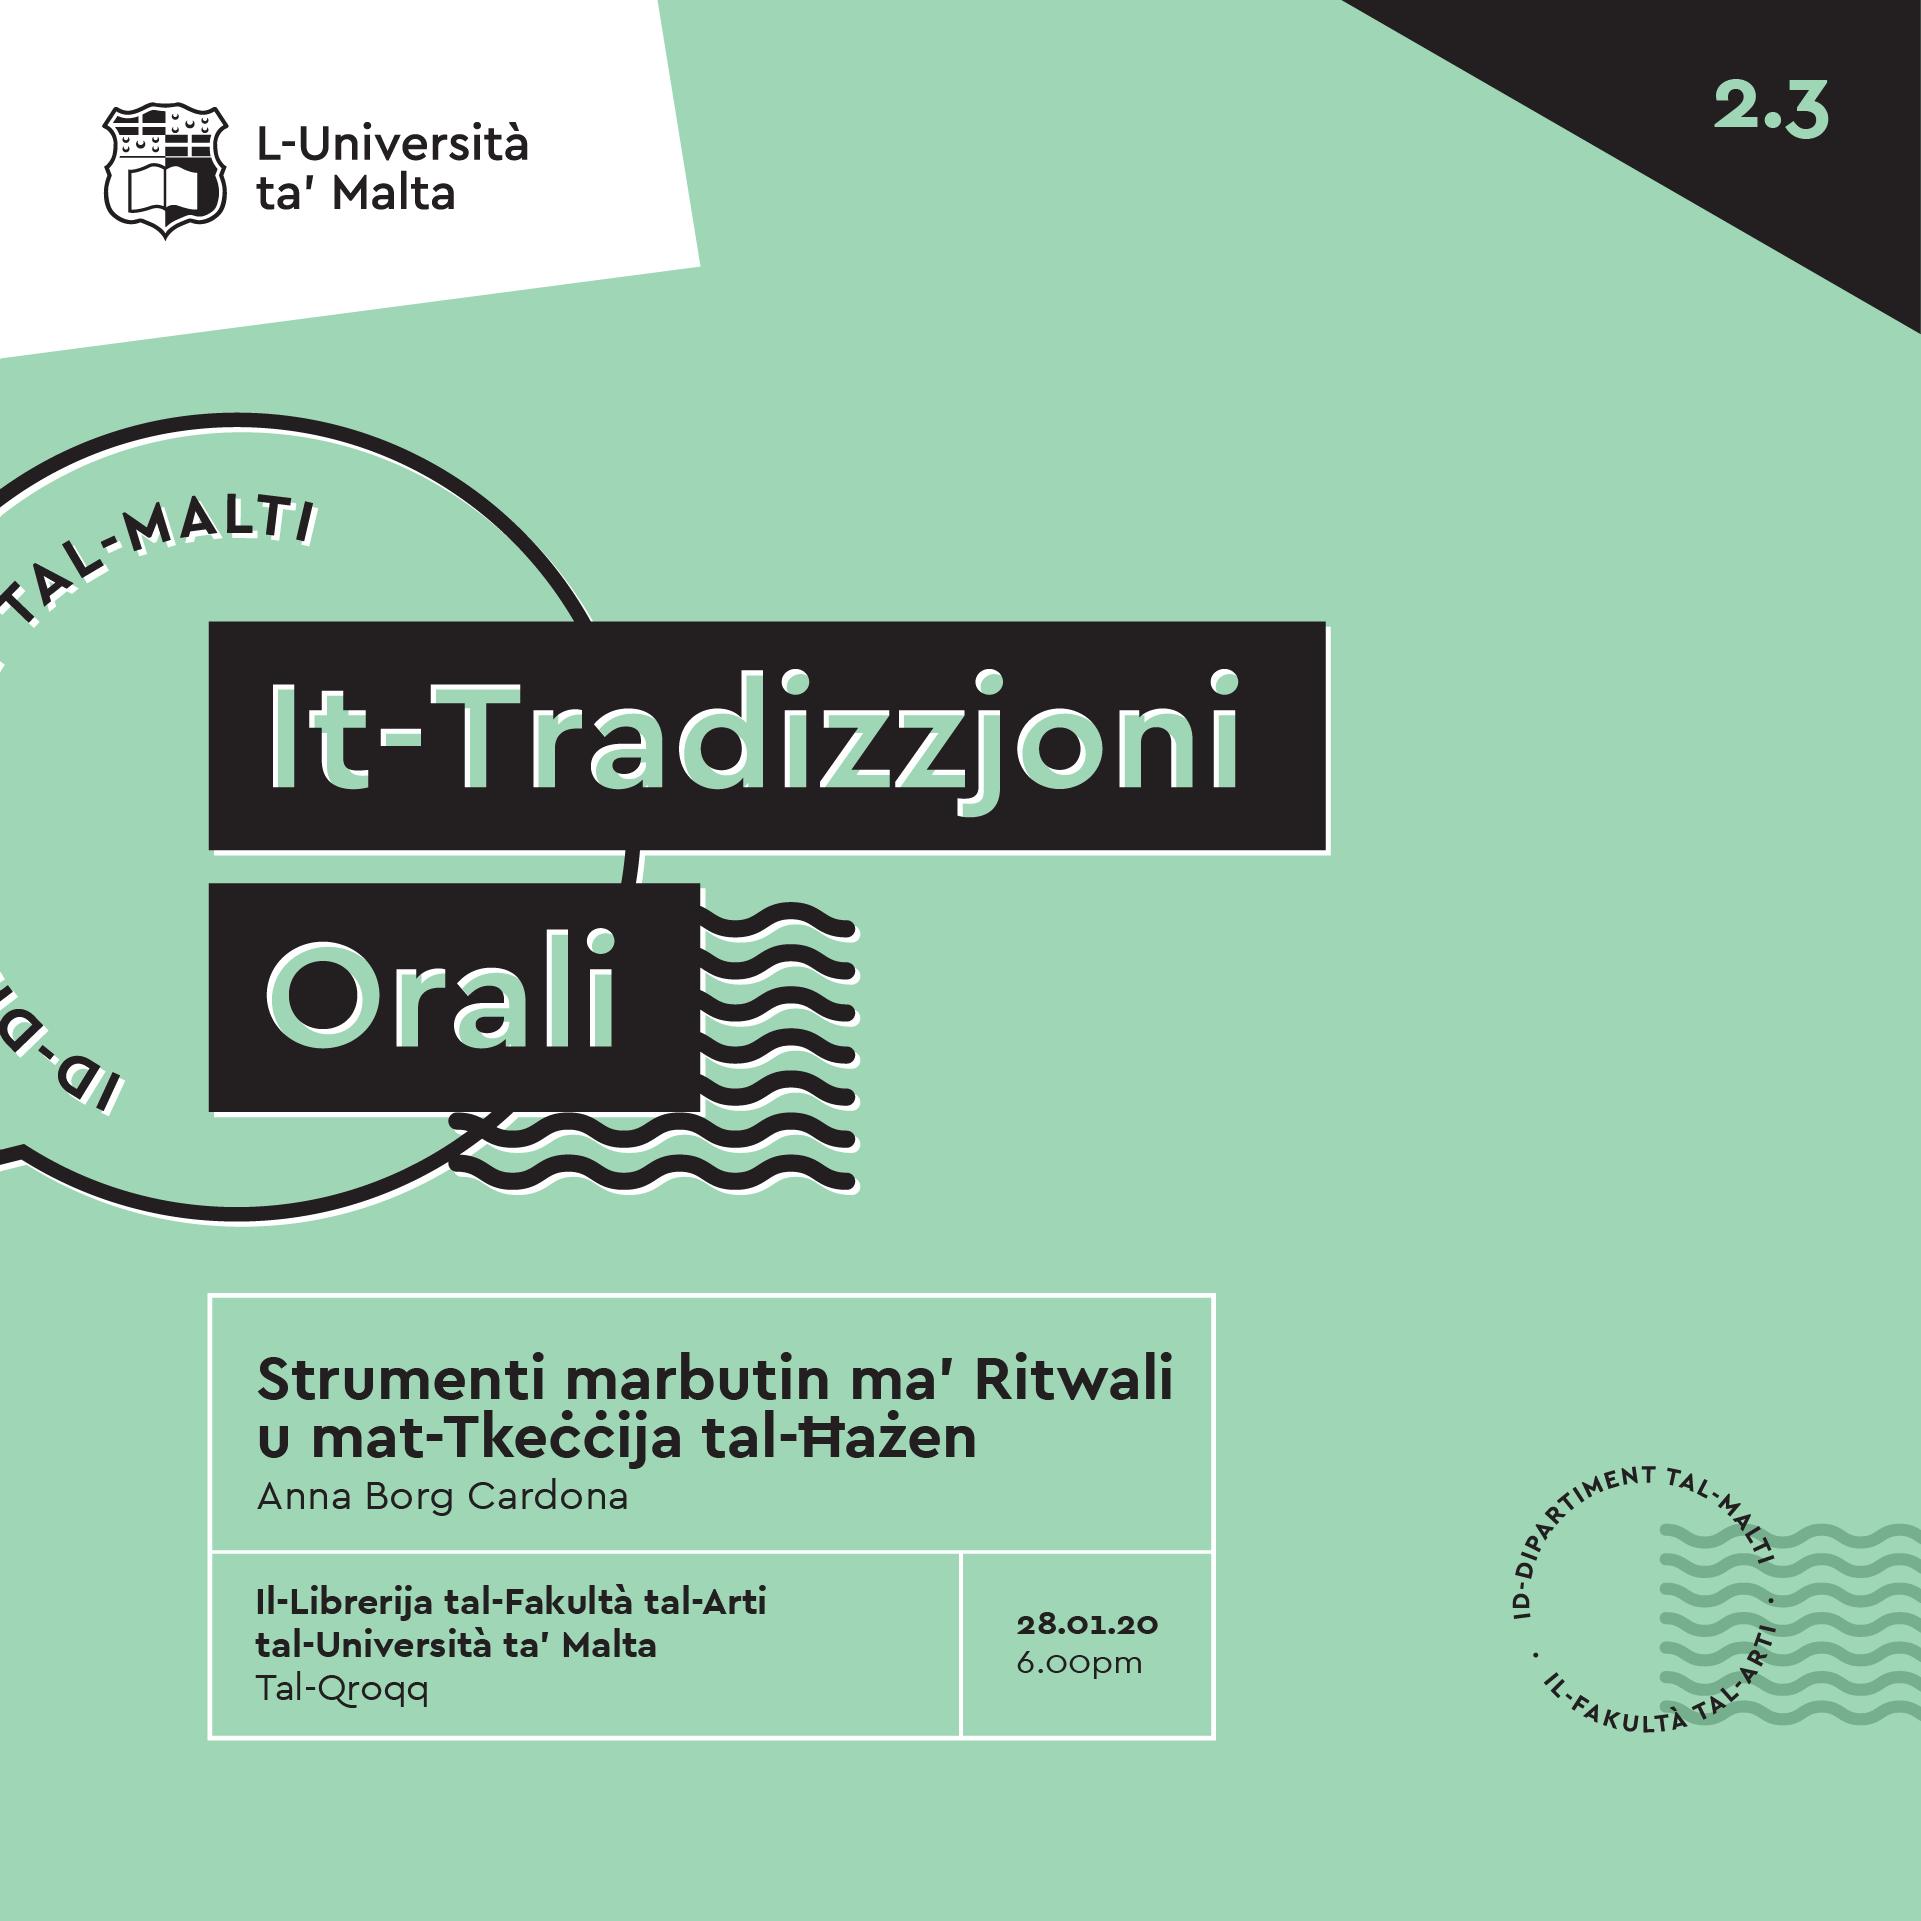 um-tradizzjoniorali-19-square-2-3